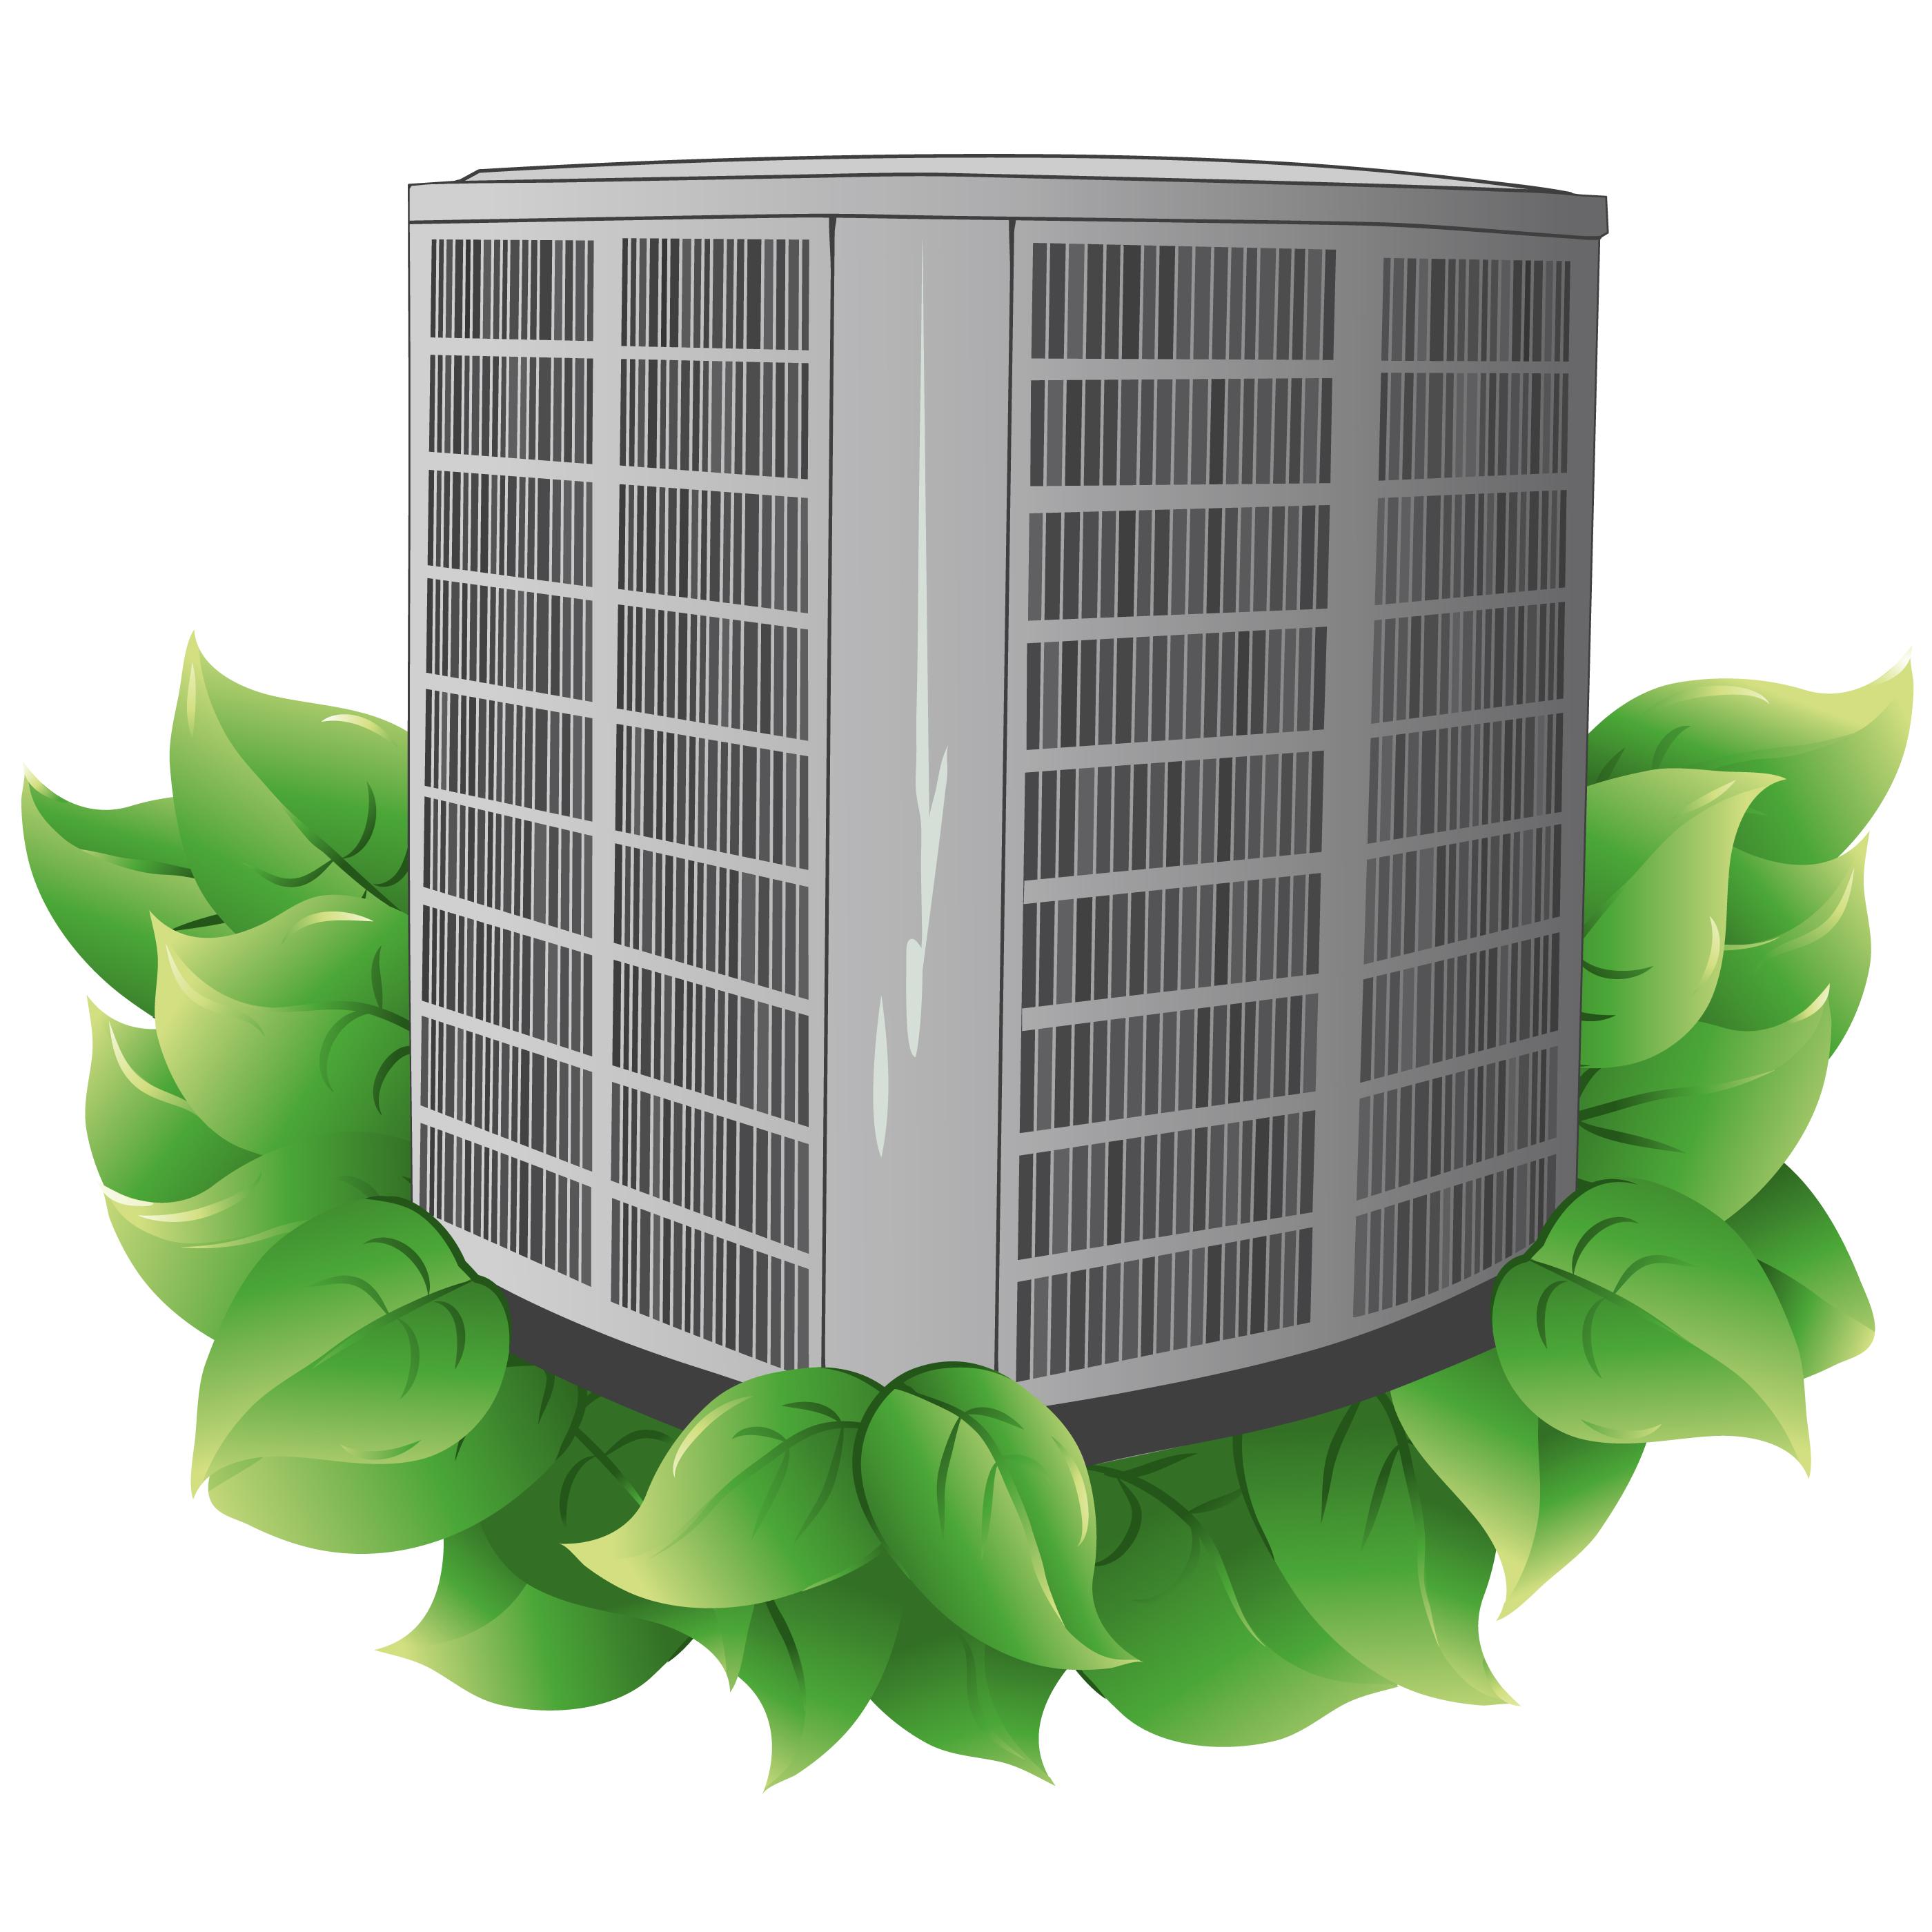 Free HVAC Unit Cliparts, Download Free Clip Art, Free Clip Art on ... banner freeuse download